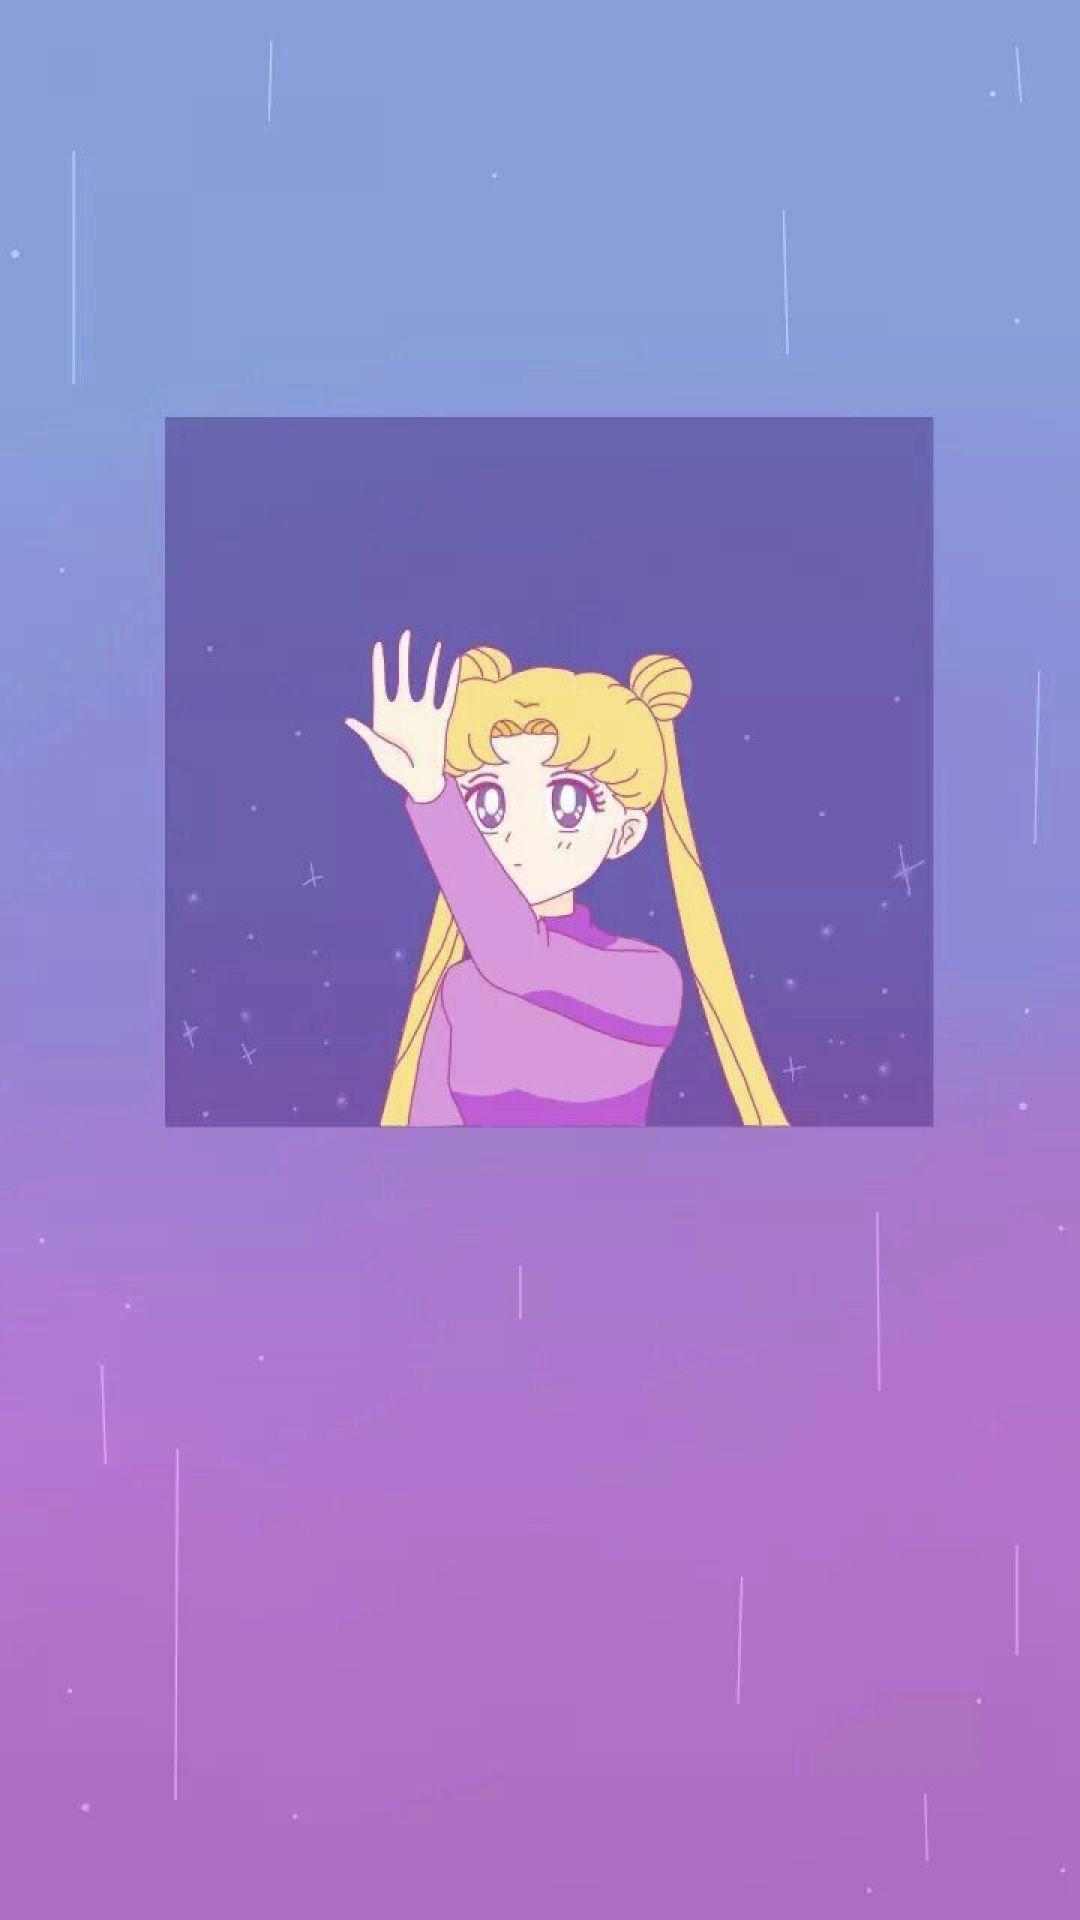 Purple Aesthetic Wallpaper Anime : Aesthetic Purple Anime ...